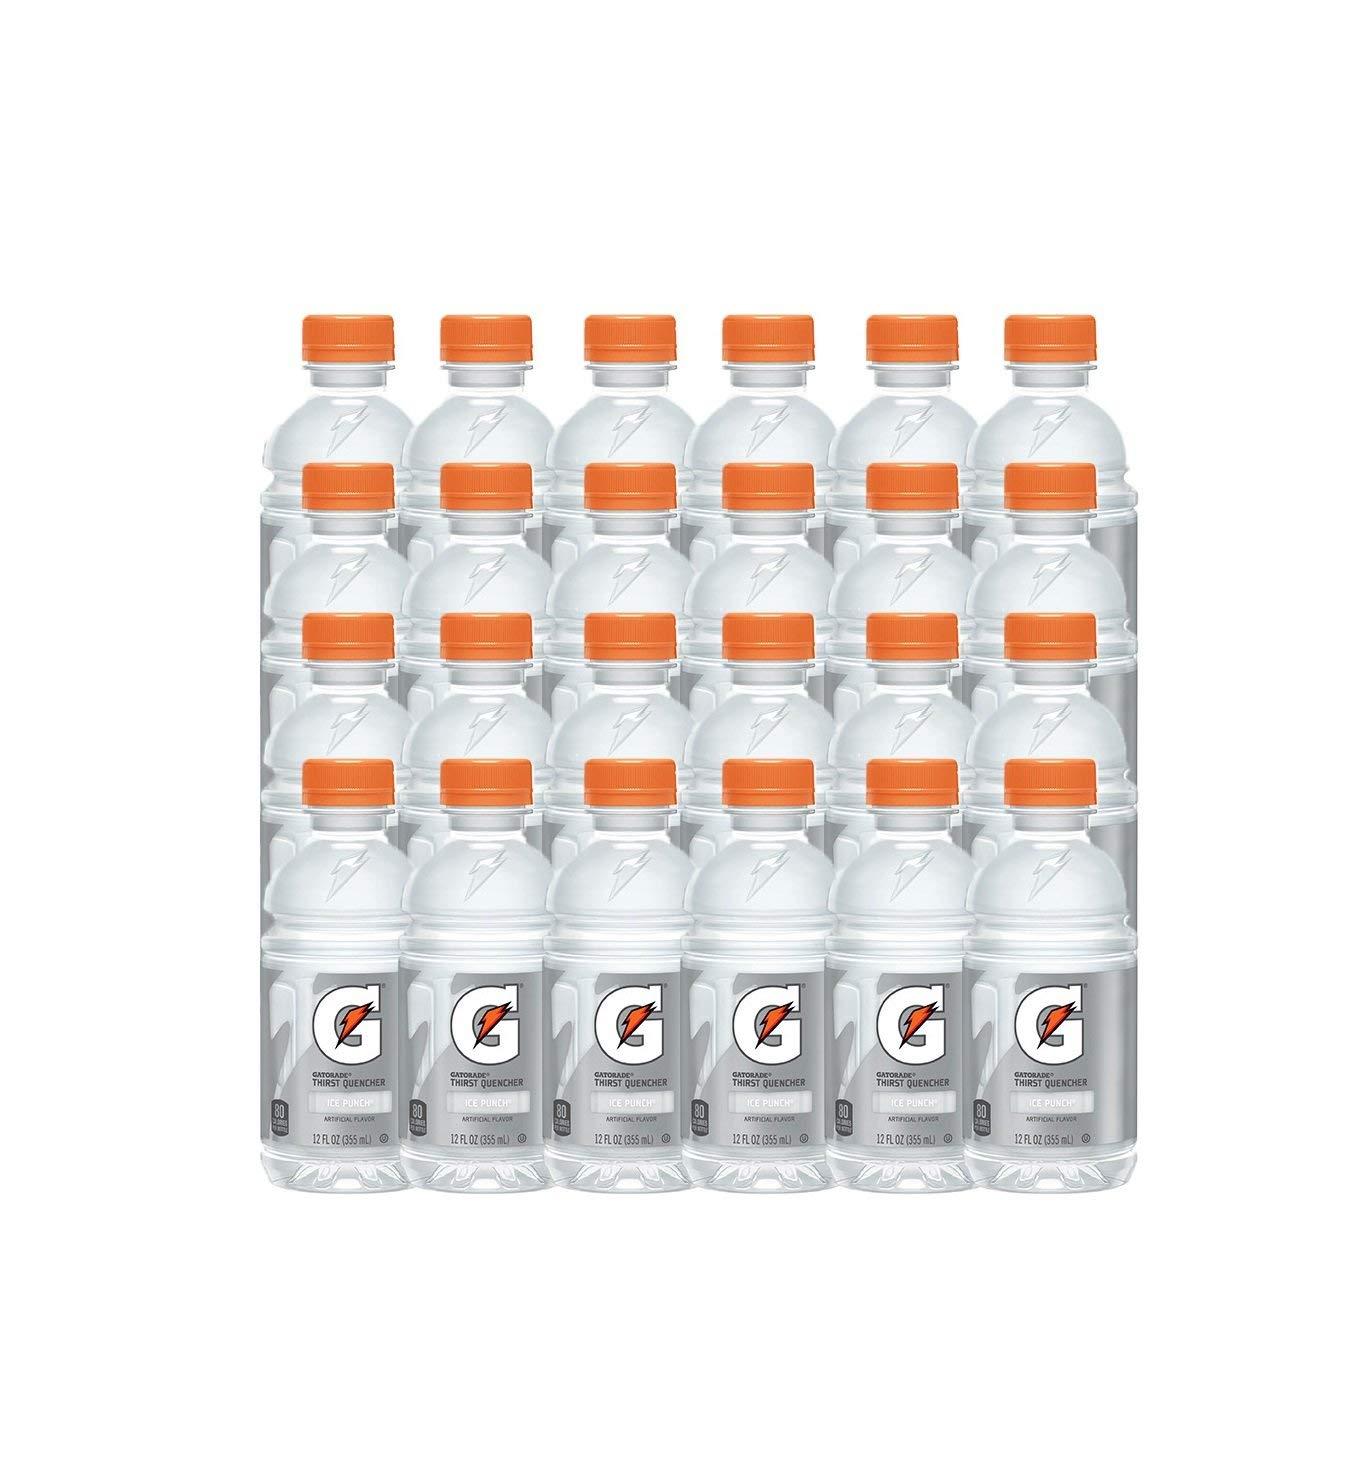 Gatorade Thirst Quencher, Ice Punch, 12 oz Bottles, 24 Count